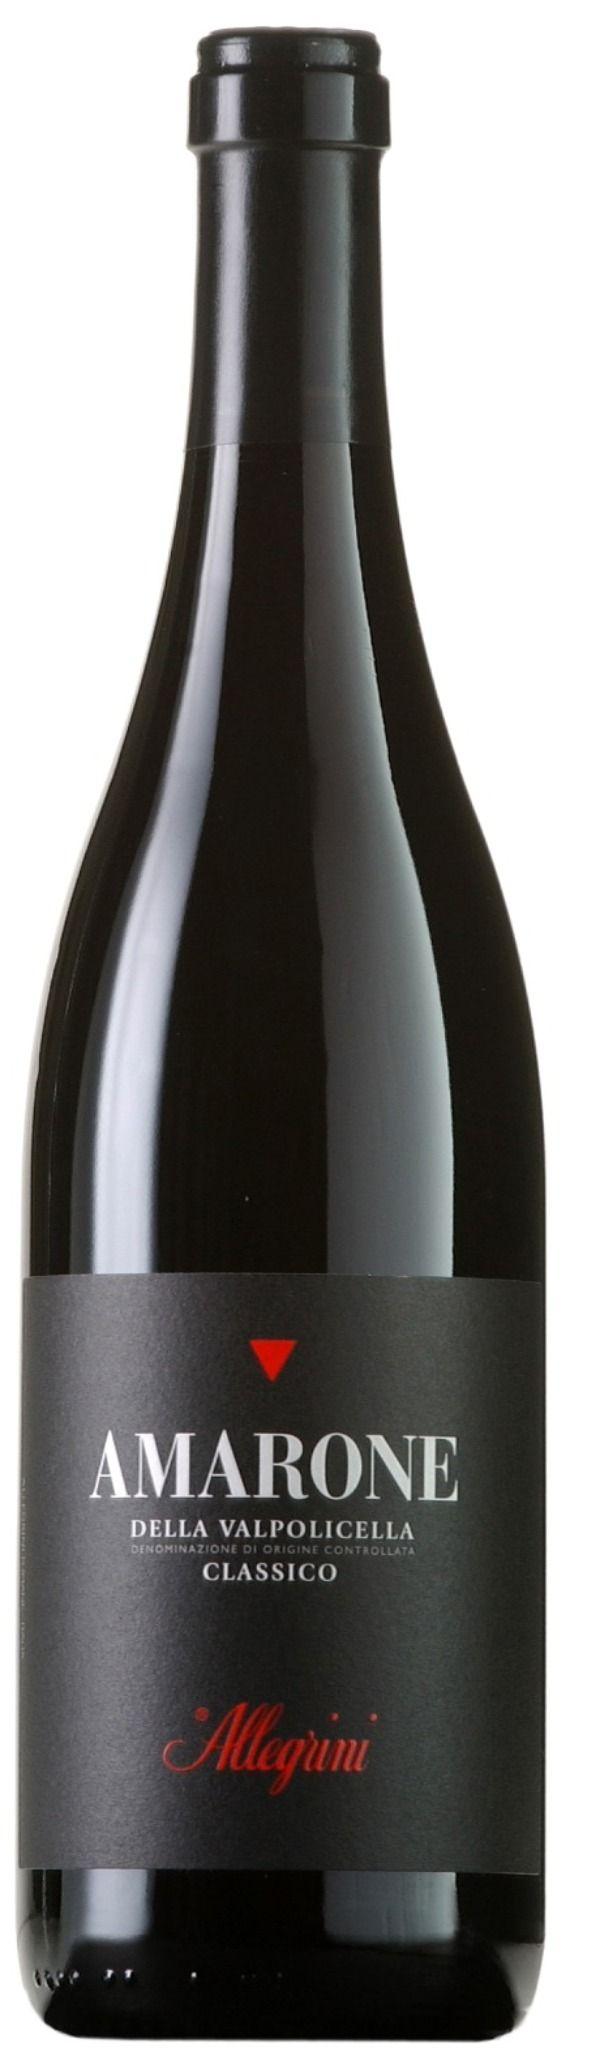 High Quality Wine: Allegrini Amarone 2008 Red Wine